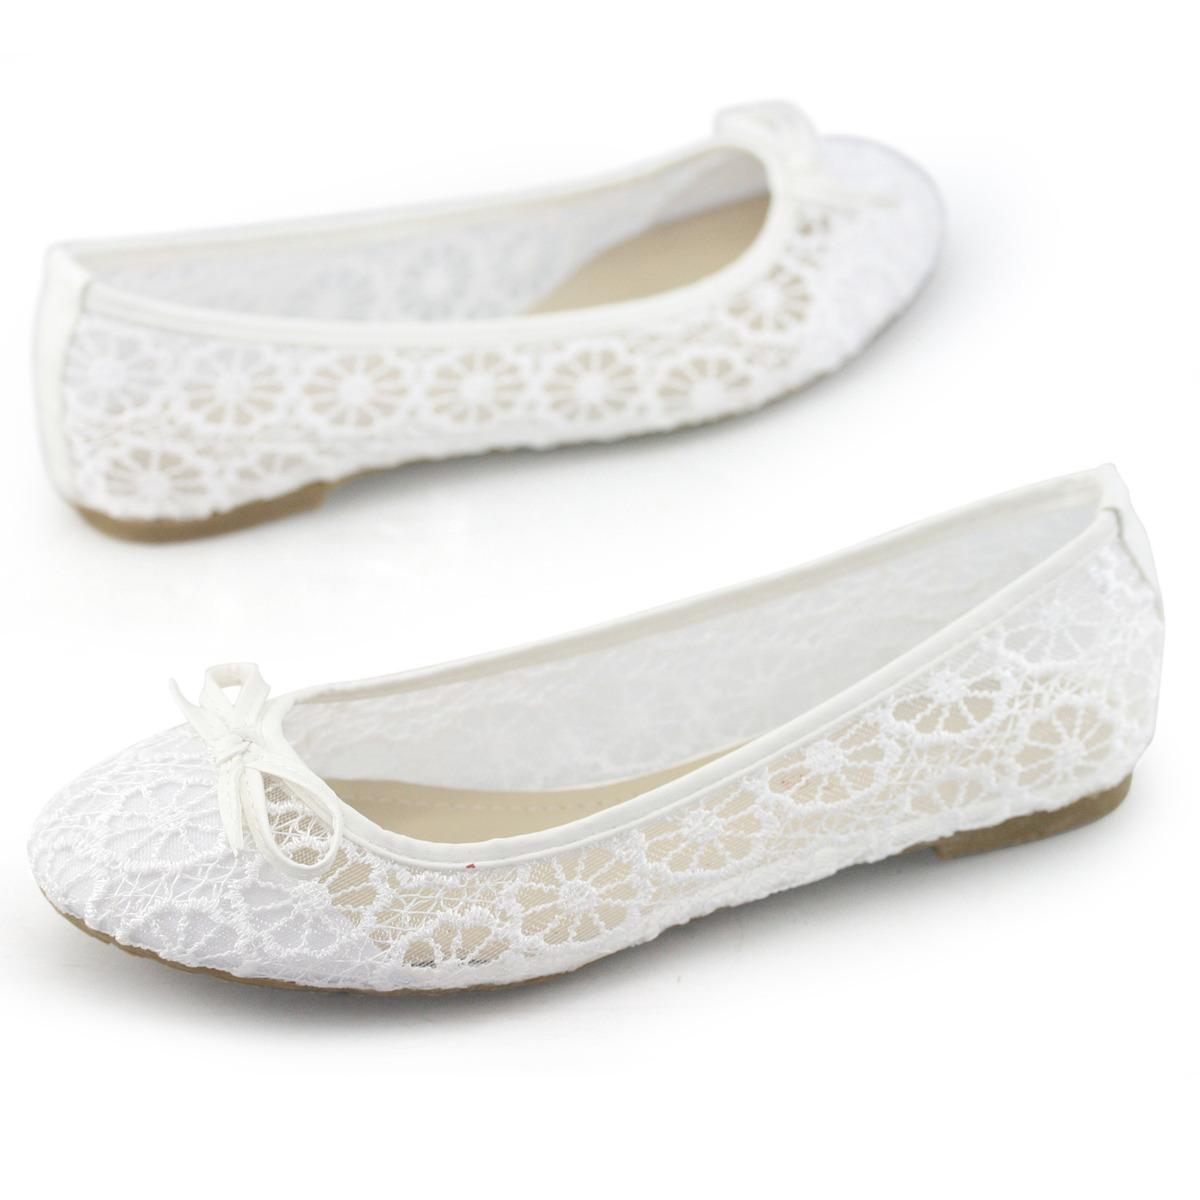 Brand Sandal Women Shoes Wedding Dress Kitten Heels Rhinestone Bling Flats Lace